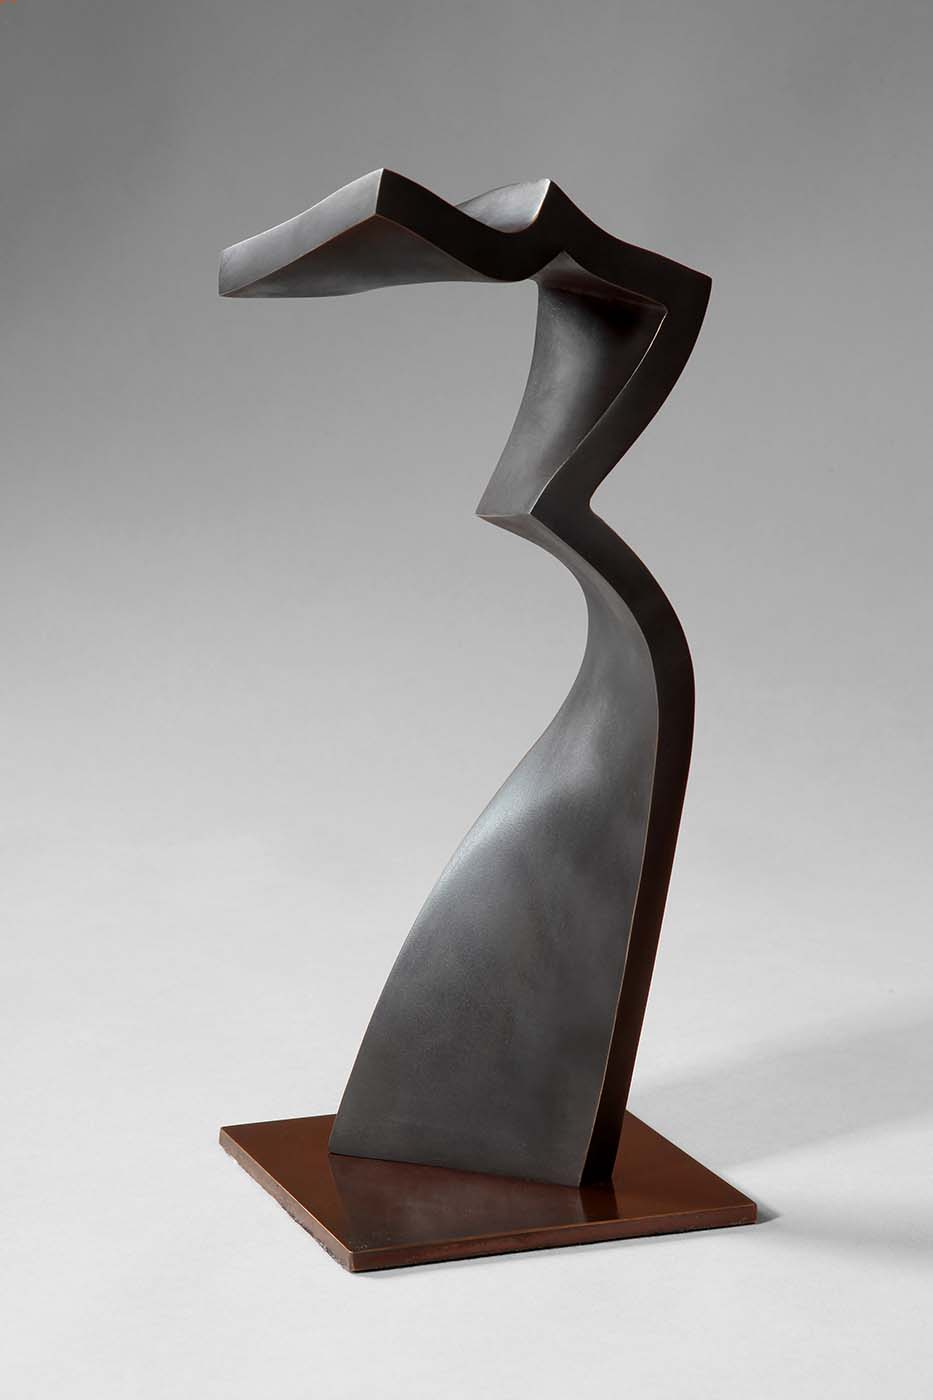 Pianist, 2012, Bronze, 30 x 14 x 12 cm (01)